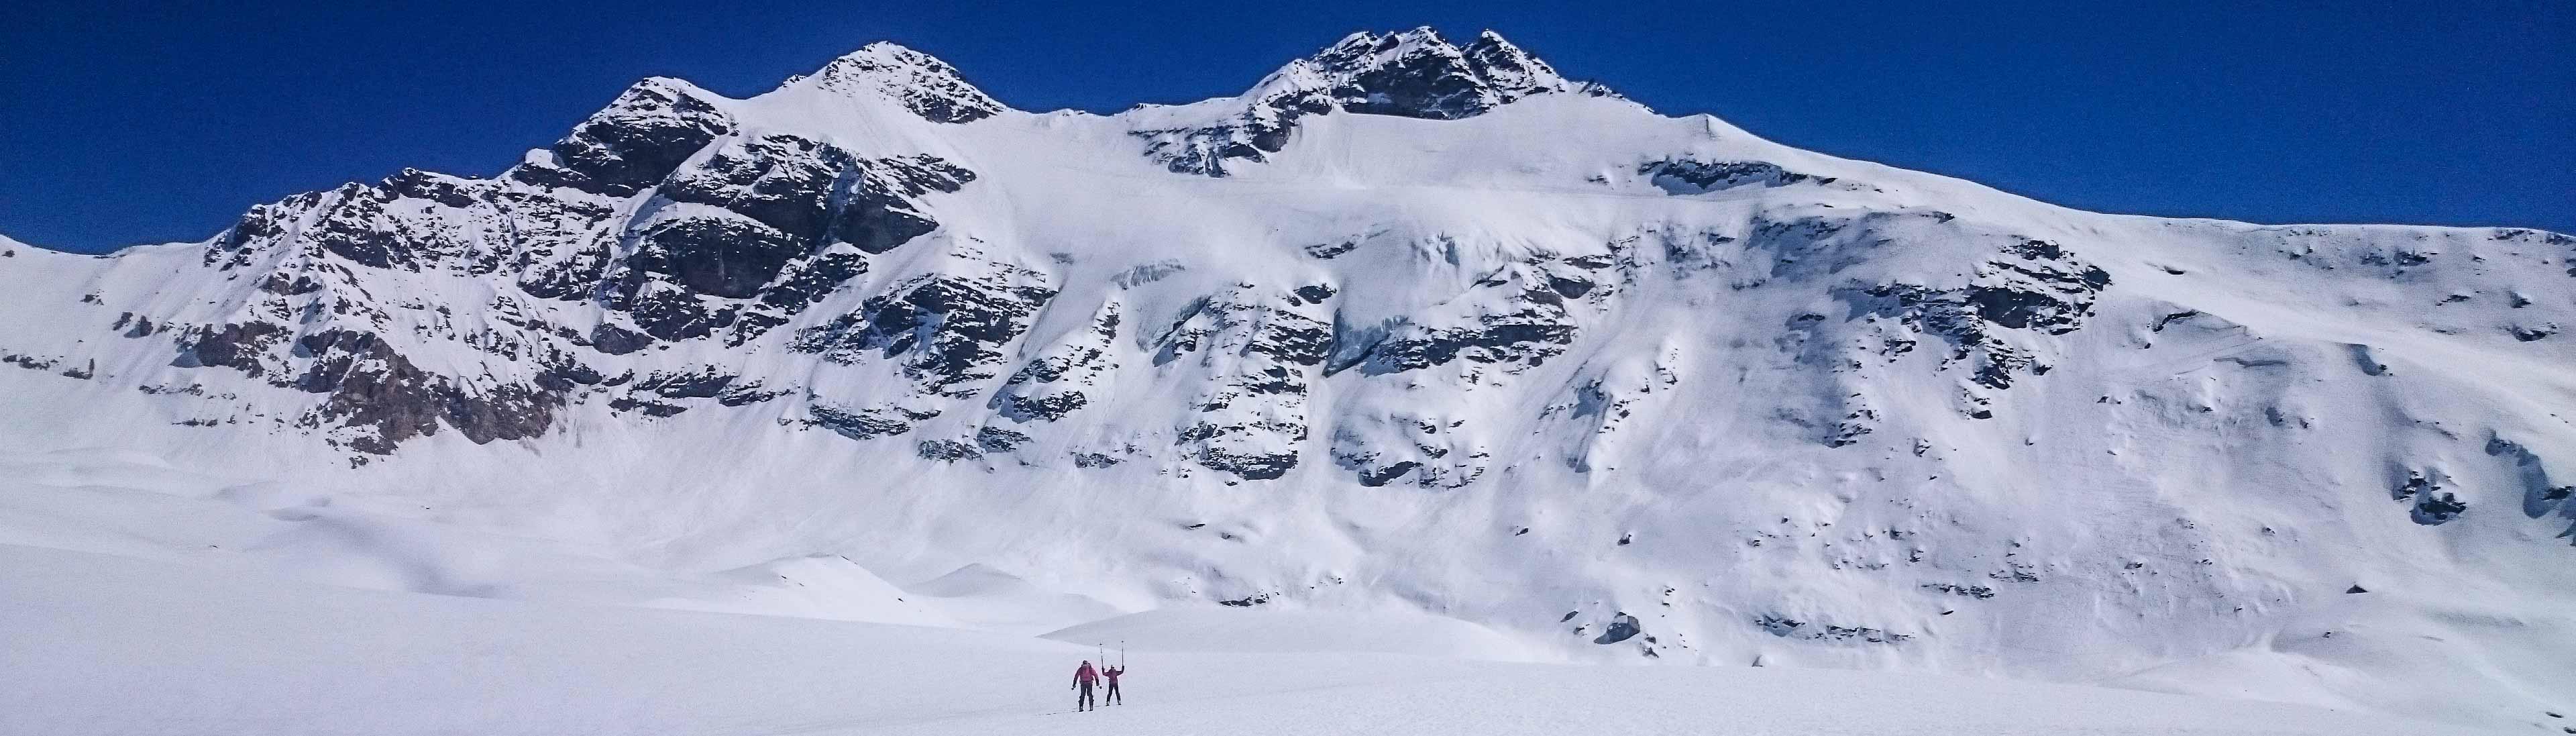 Skihochtour Italien